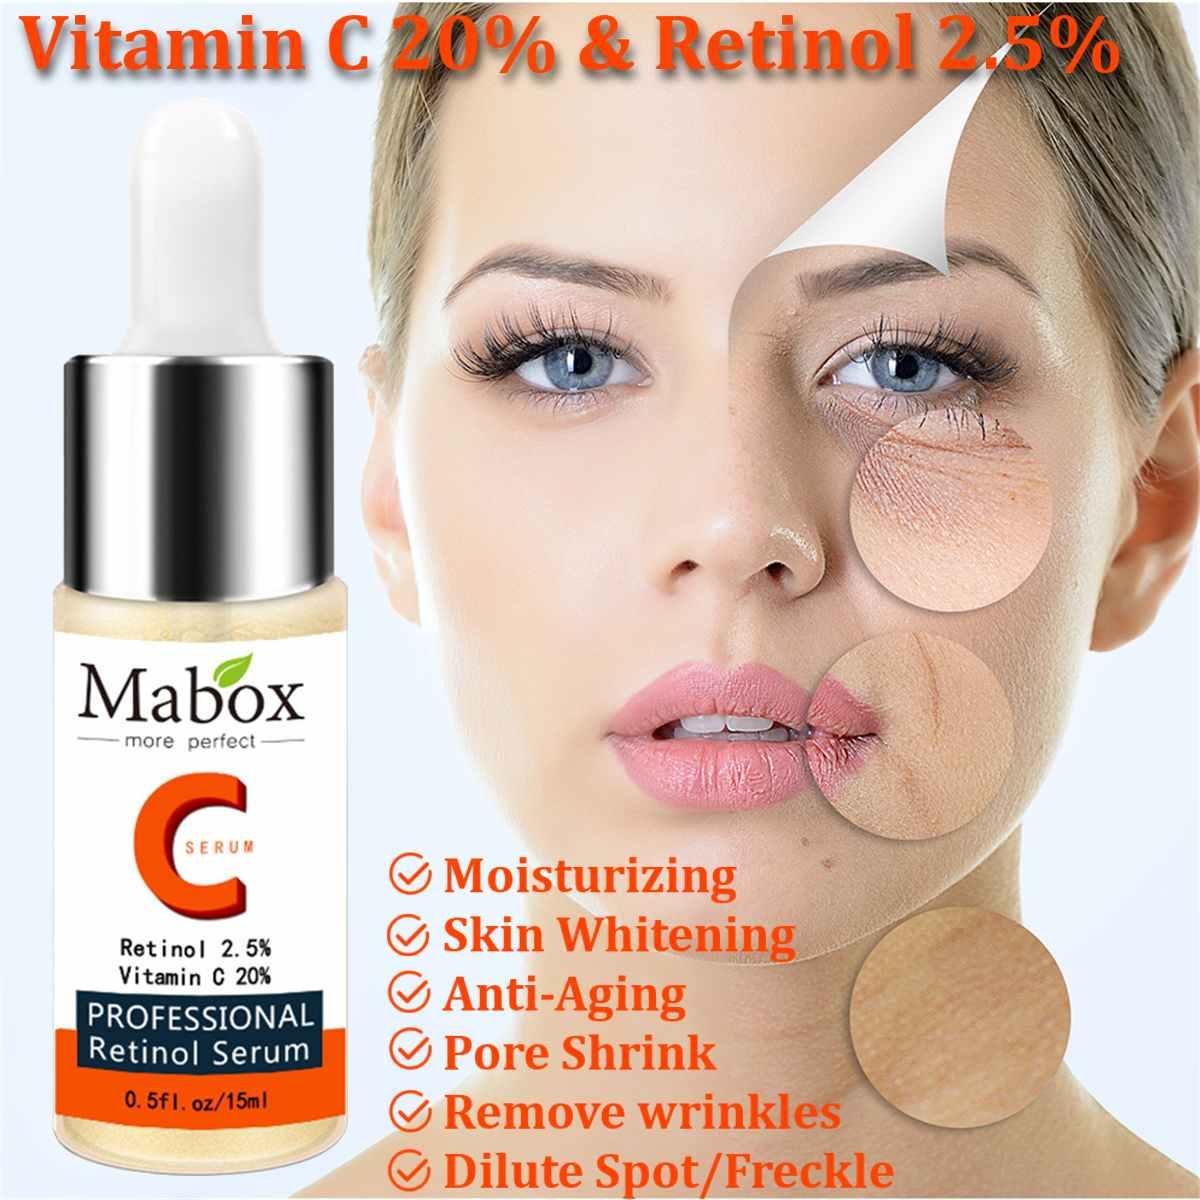 15ml mabox 20% vitamina c soro 2.5% retinol rosto soro ácido hialurónico clareamento anti-envelhecimento enrugamento essência